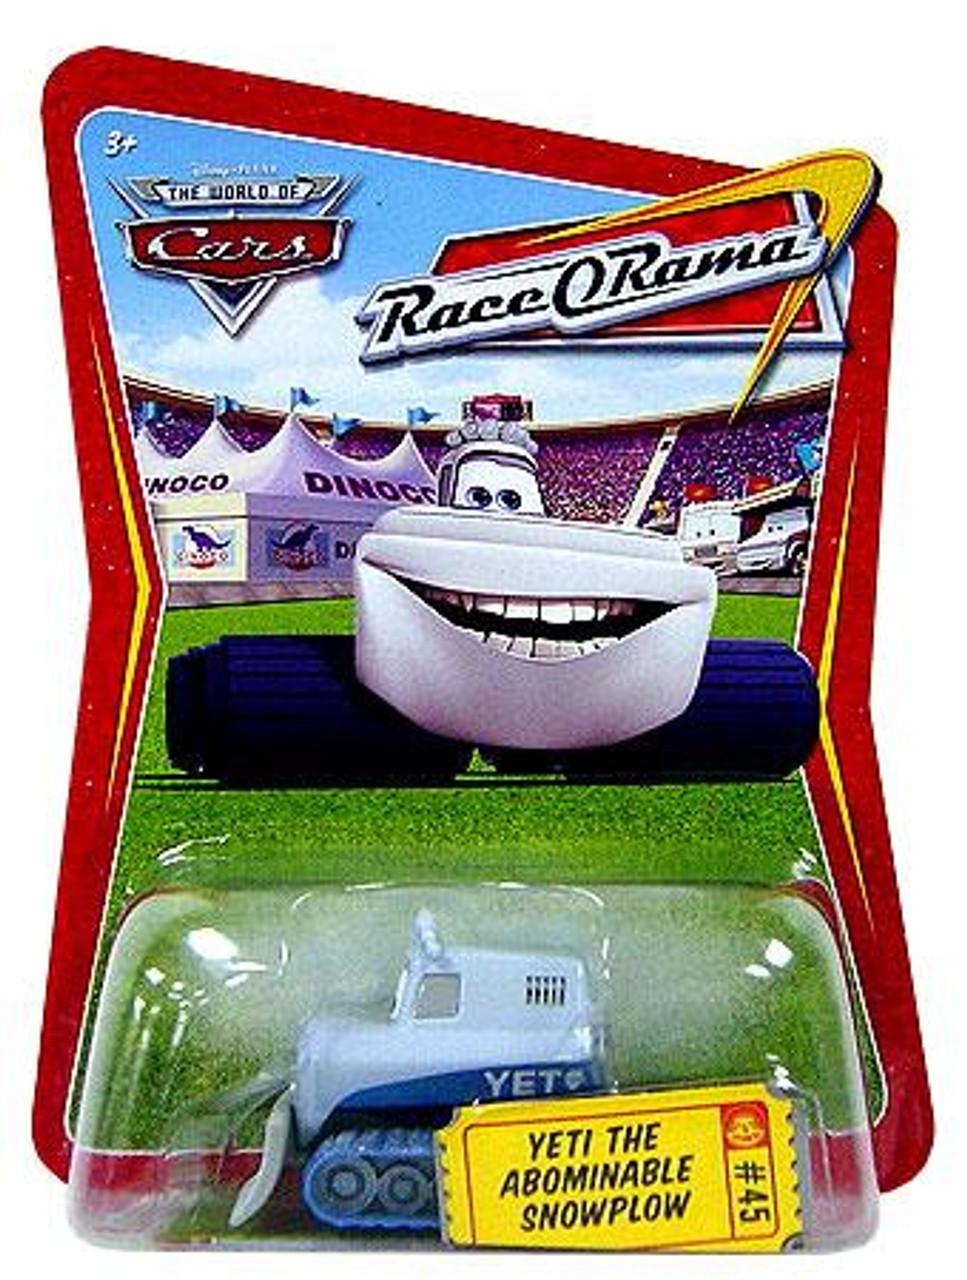 Disney Cars The World of Cars Race-O-Rama Yeti The Abominable Snowplow Diecast Car #45